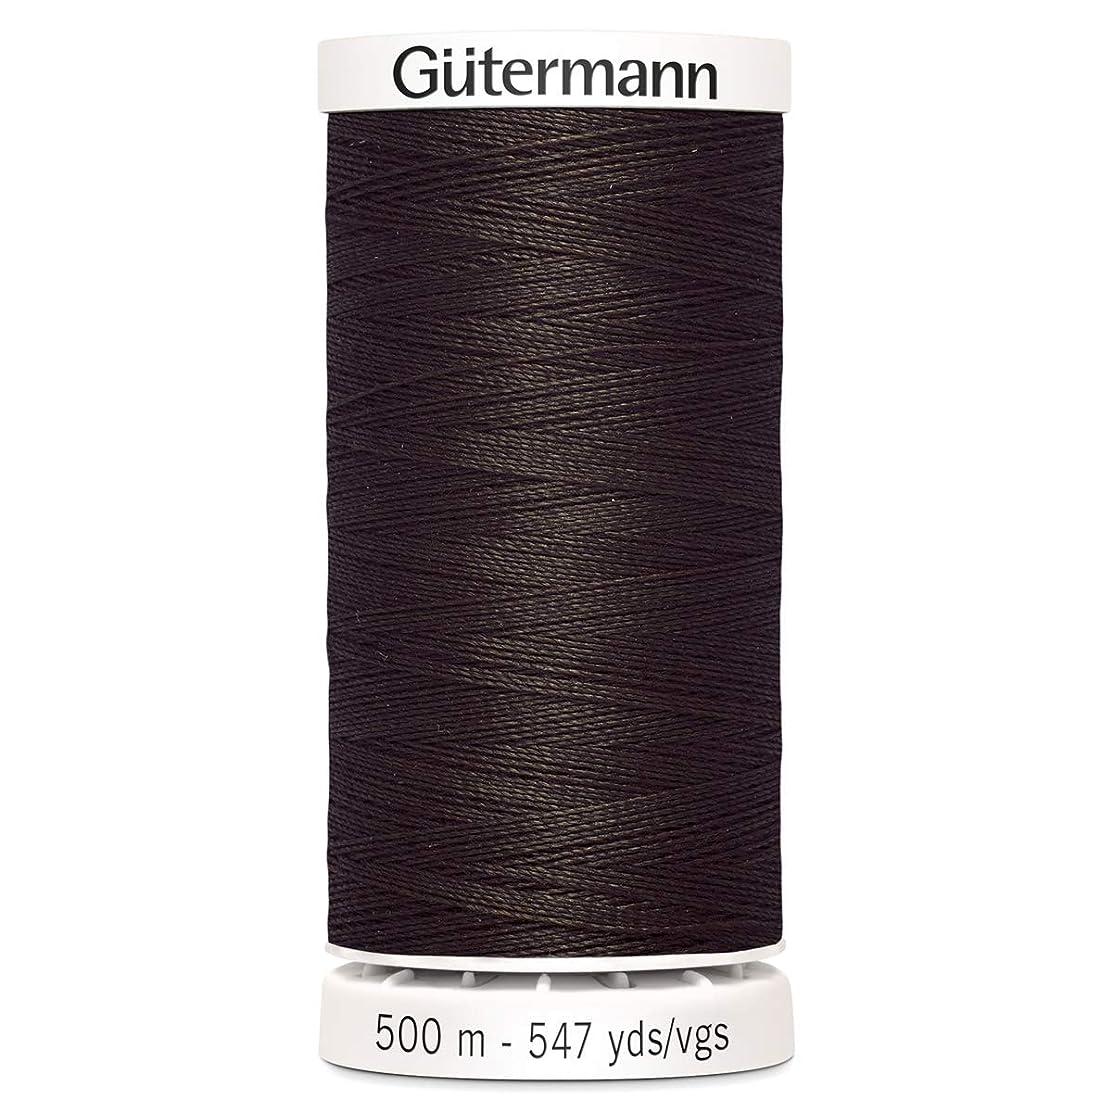 Gutermann Sew All Polyester Thread, 500mtr, Mahogany (0696), 5.5 x 3 x 3 cm